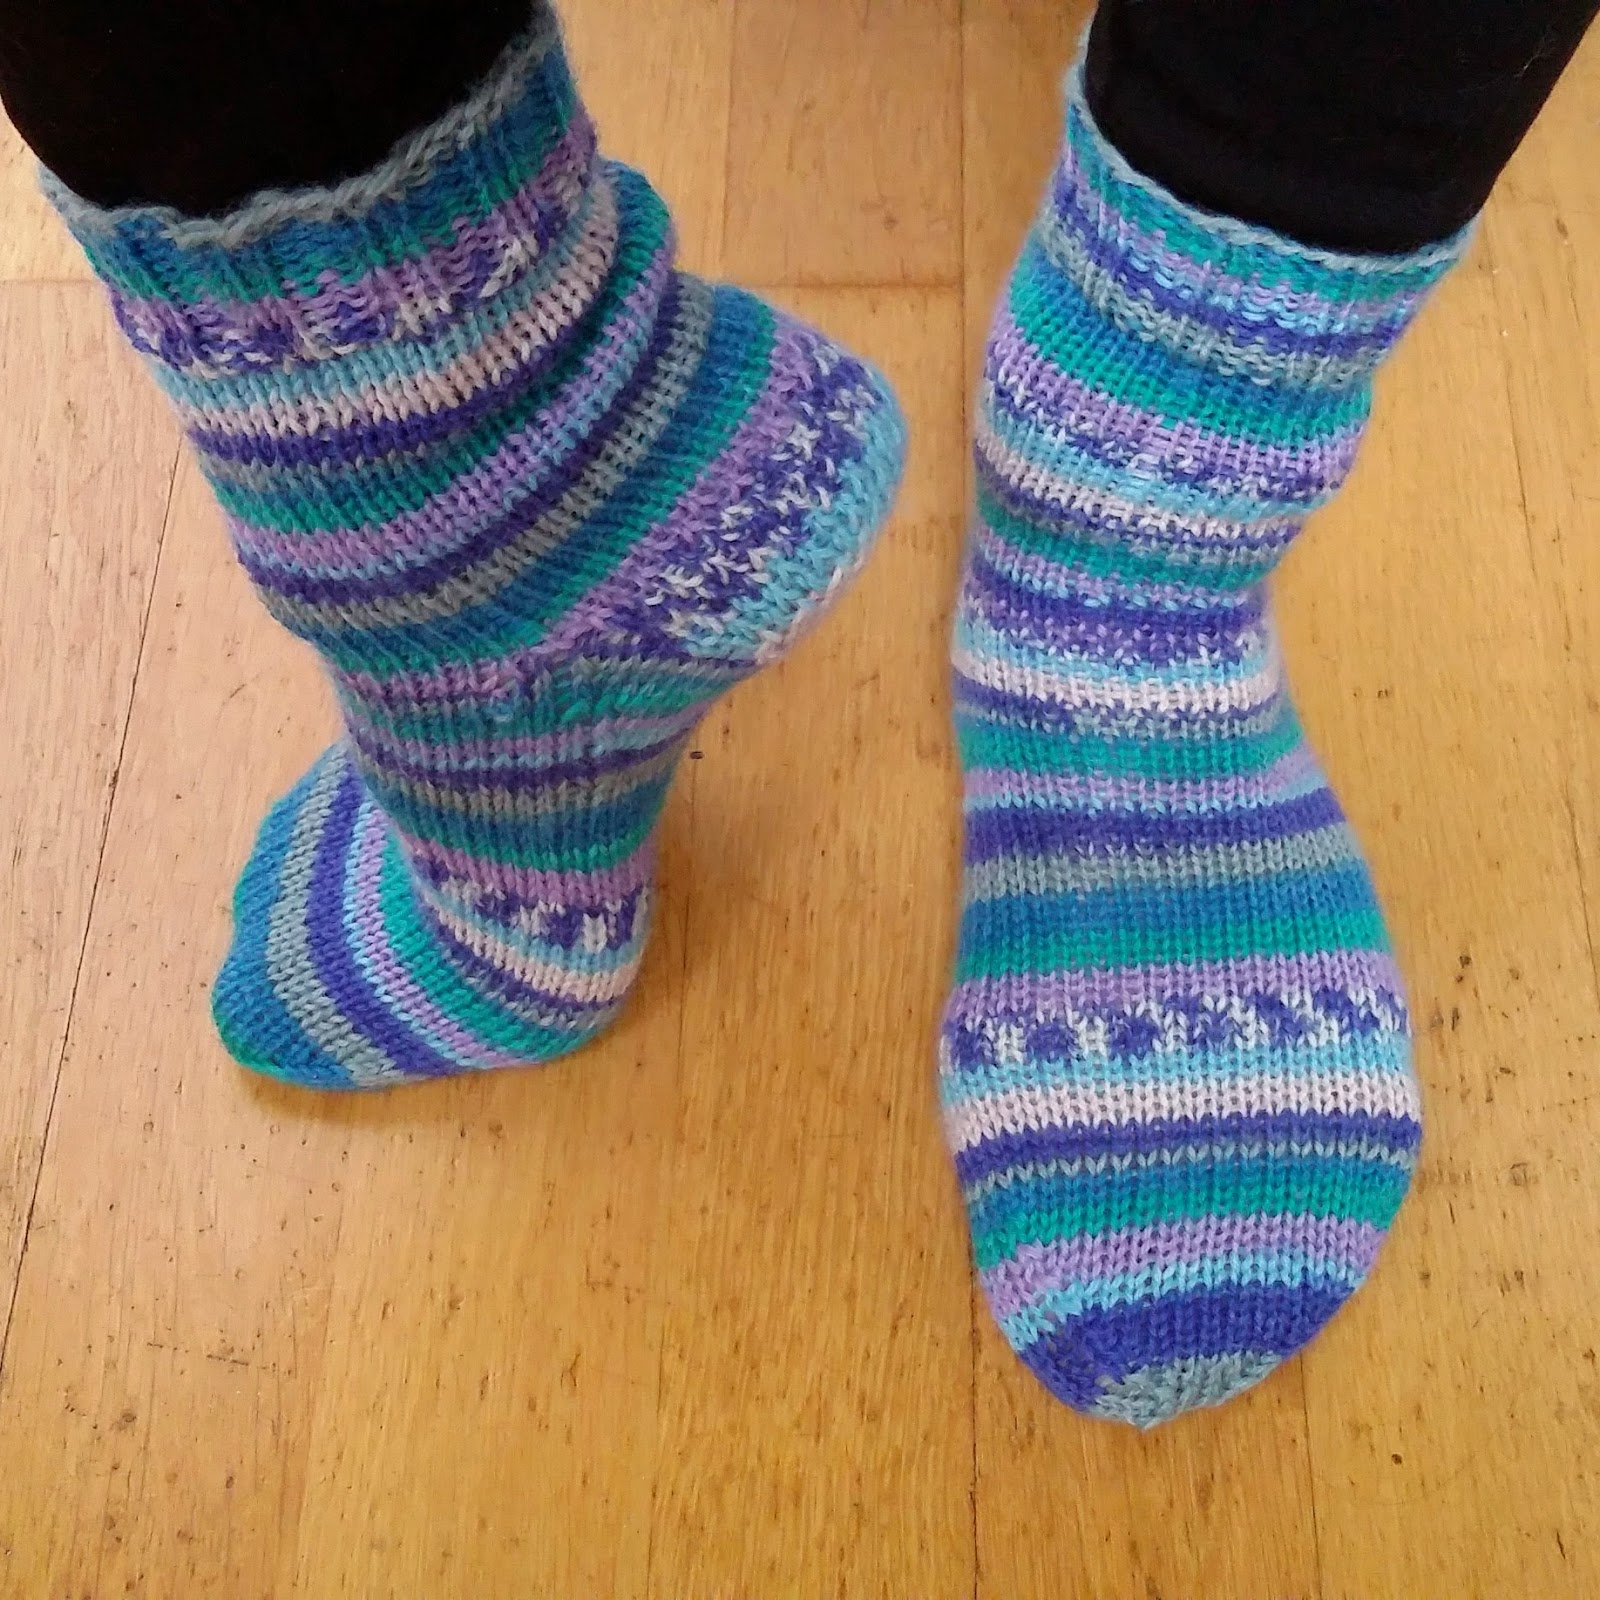 2015-02-05_knitcol-socks1.pg.jpg